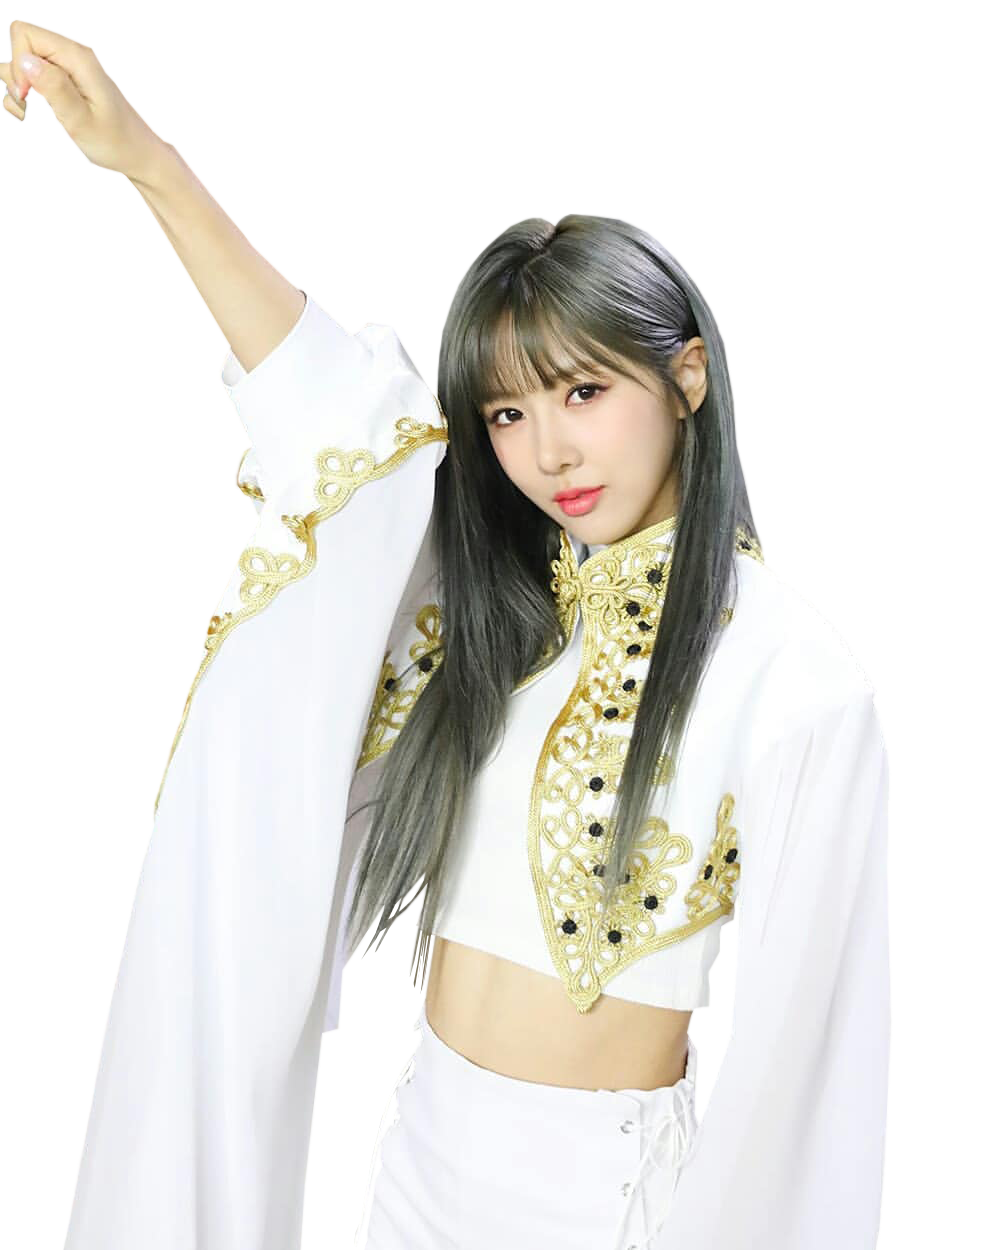 Yoohyeon Deja Vu Era Png 1 By Foryoubytl On Deviantart